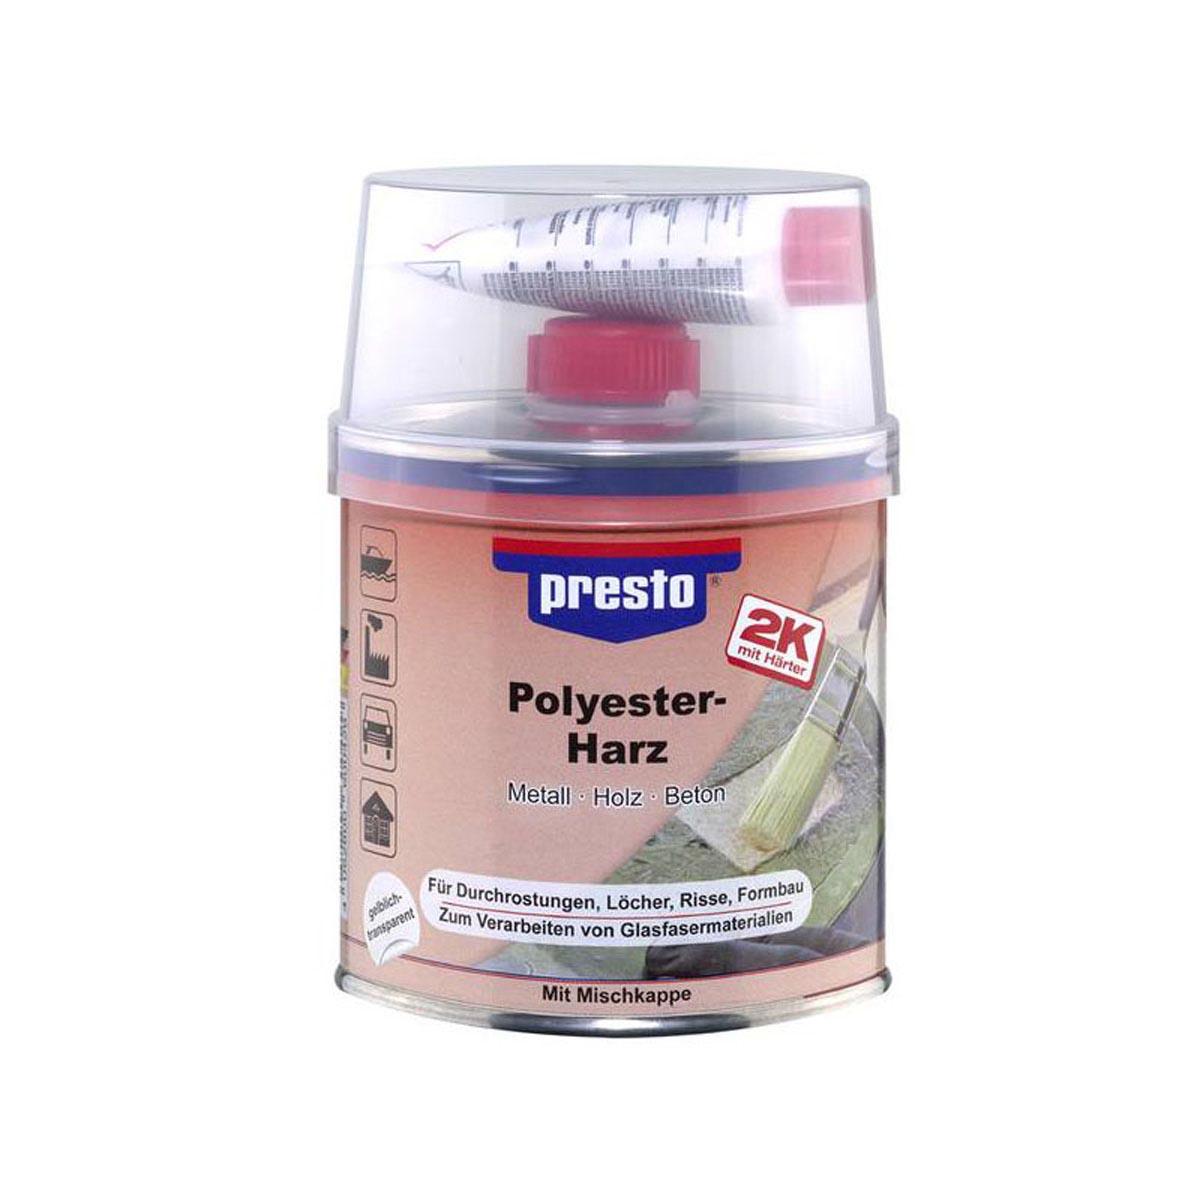 Polyesterharz, honigfarben, 5 kg